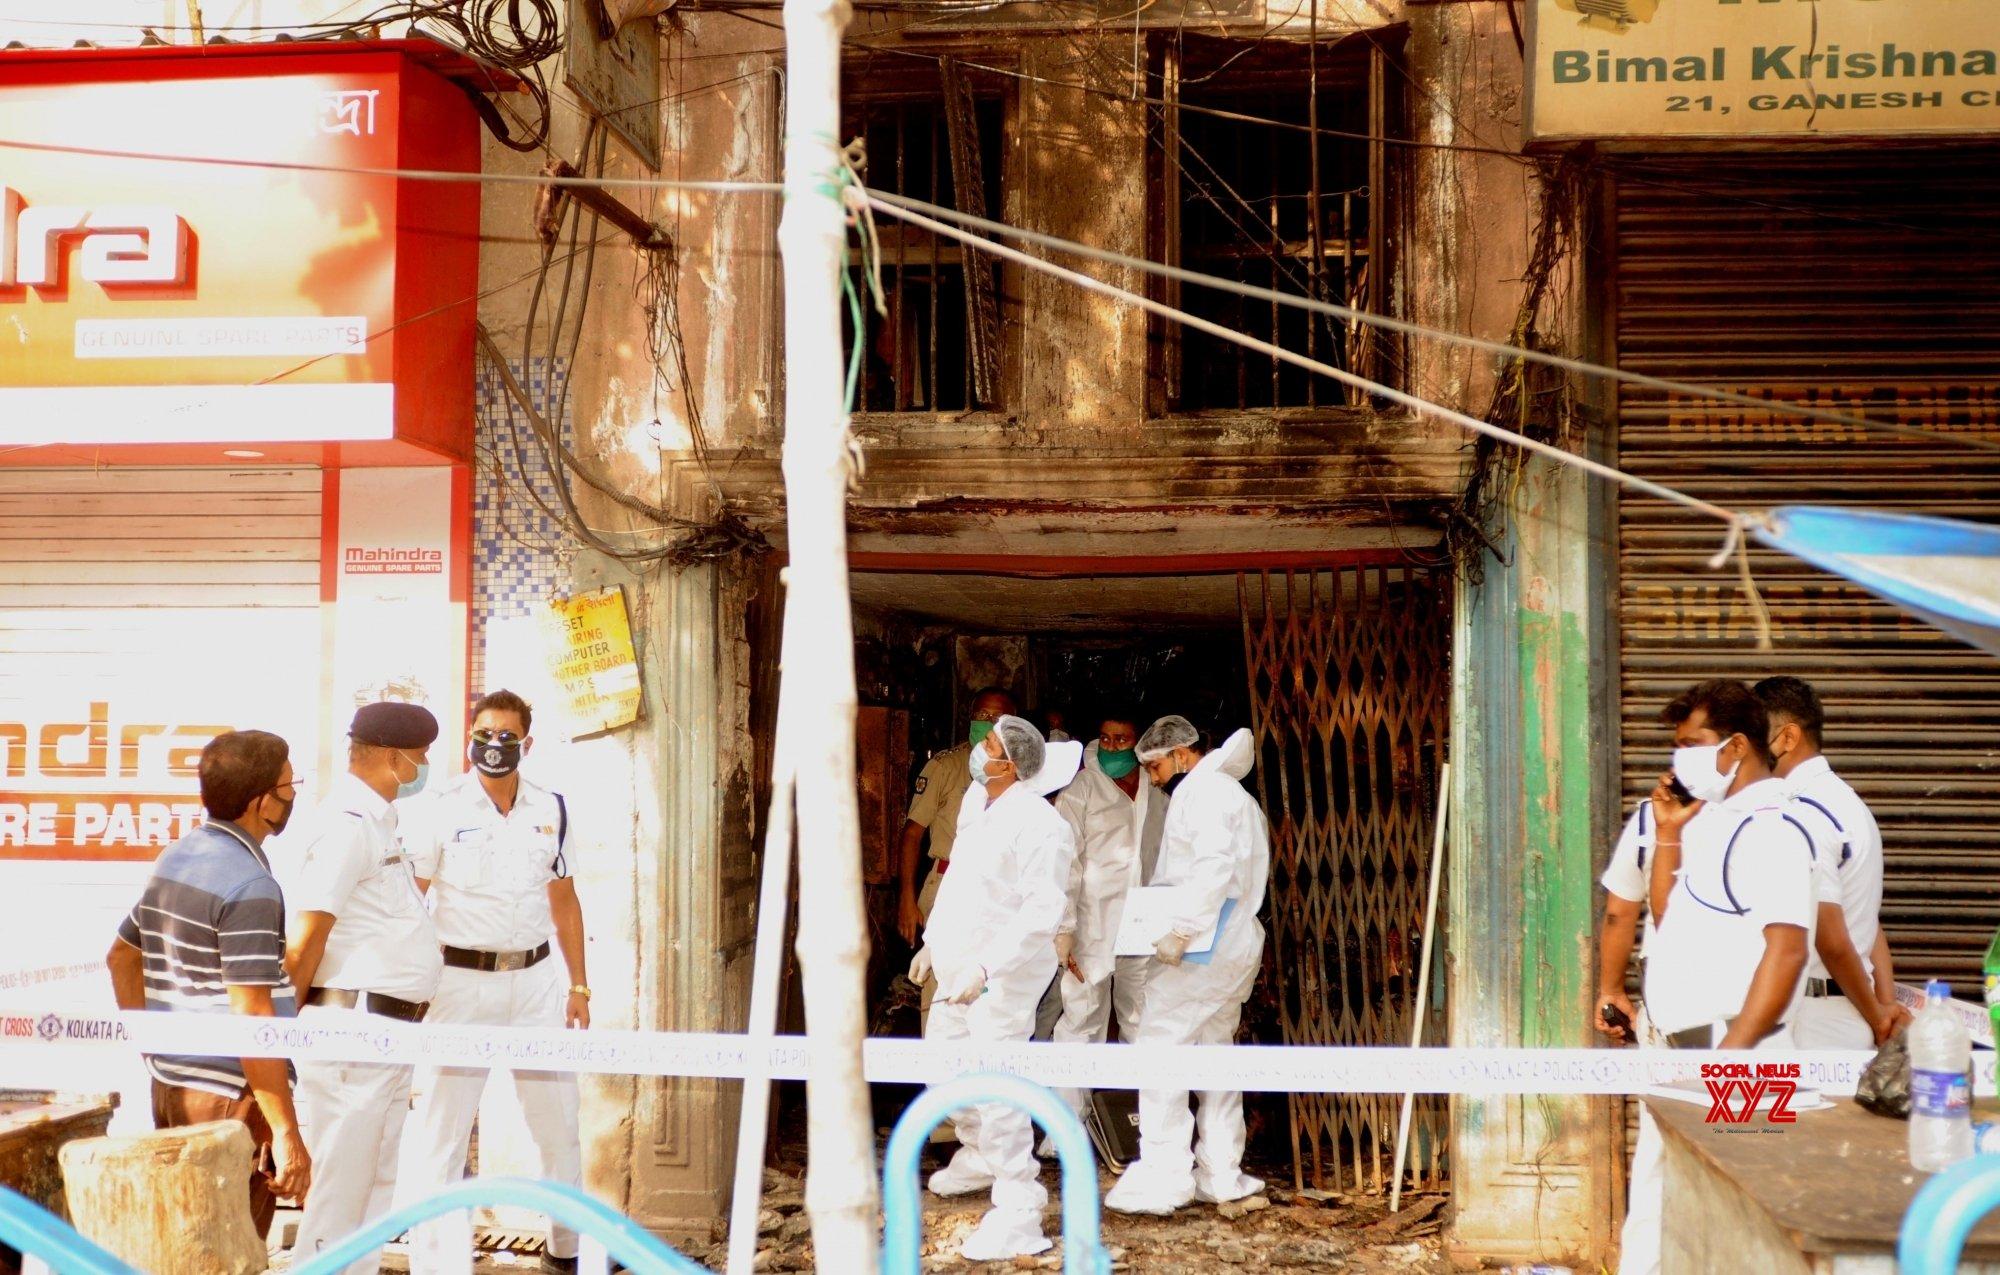 Kolkata: Kolkata police forensic team reaches Ganesh Chandra Avenue for investigation in fire mishap #Gallery